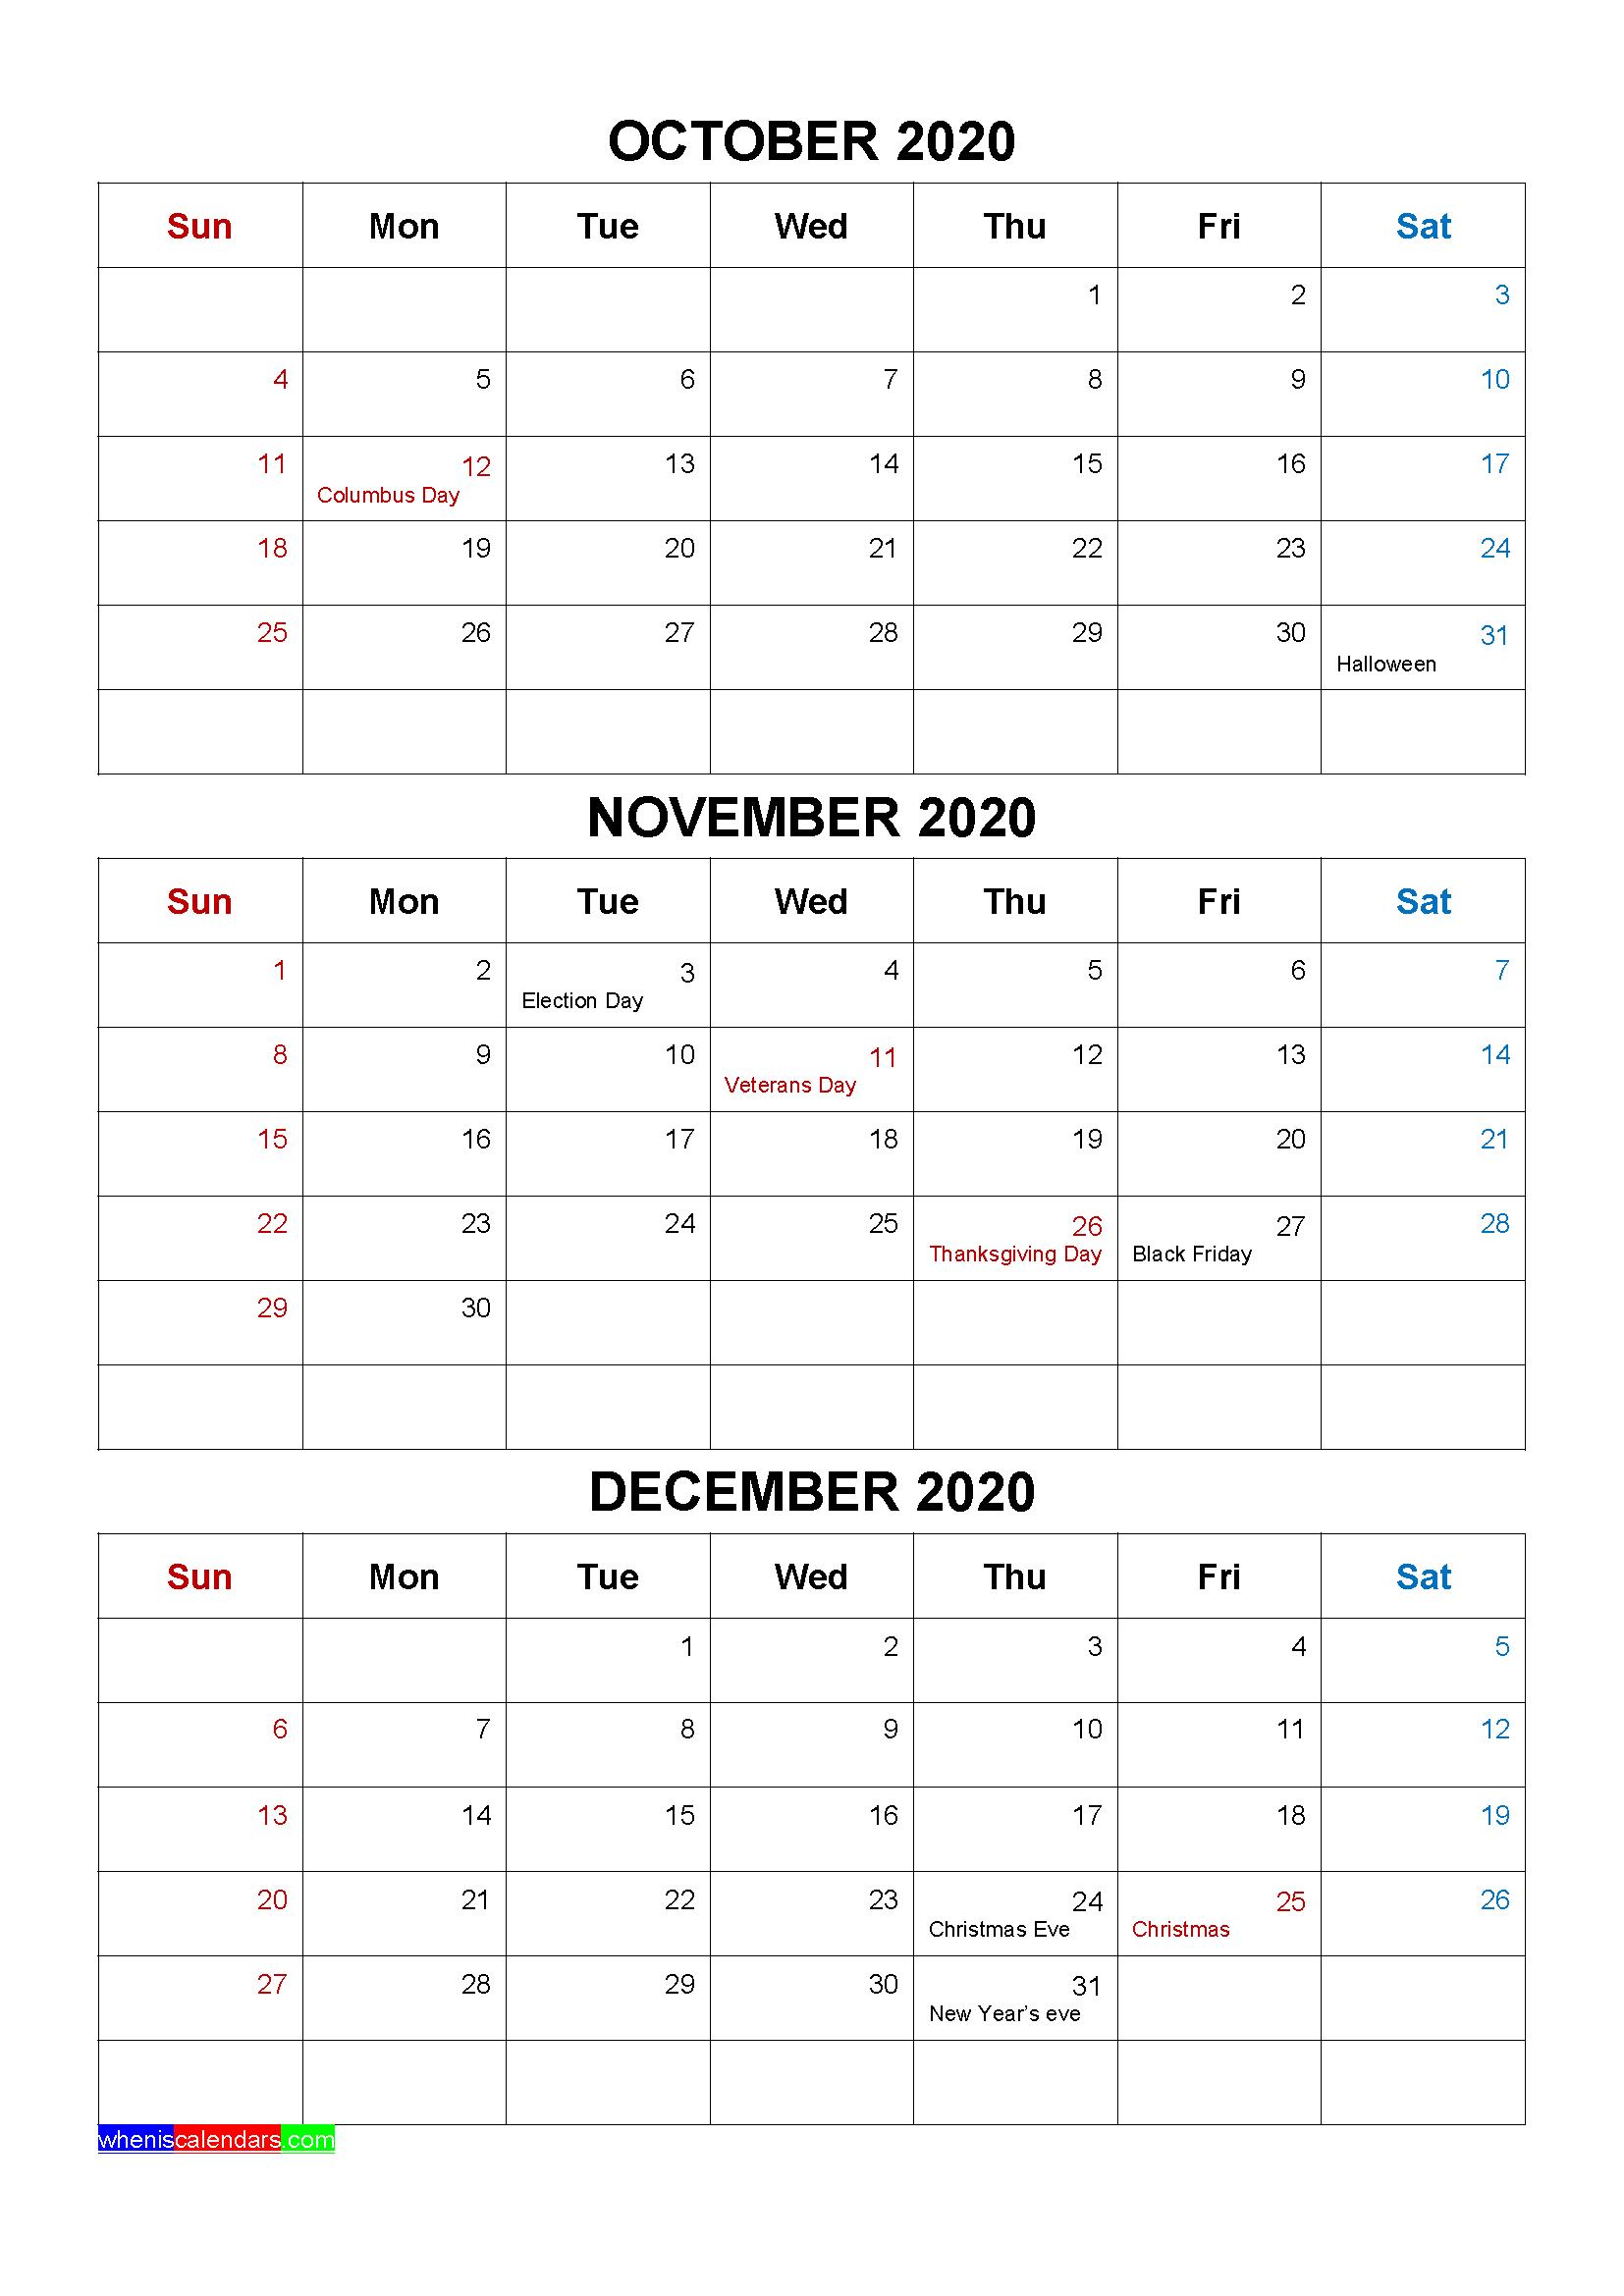 Free October November December 2020 Calendar with Holidays